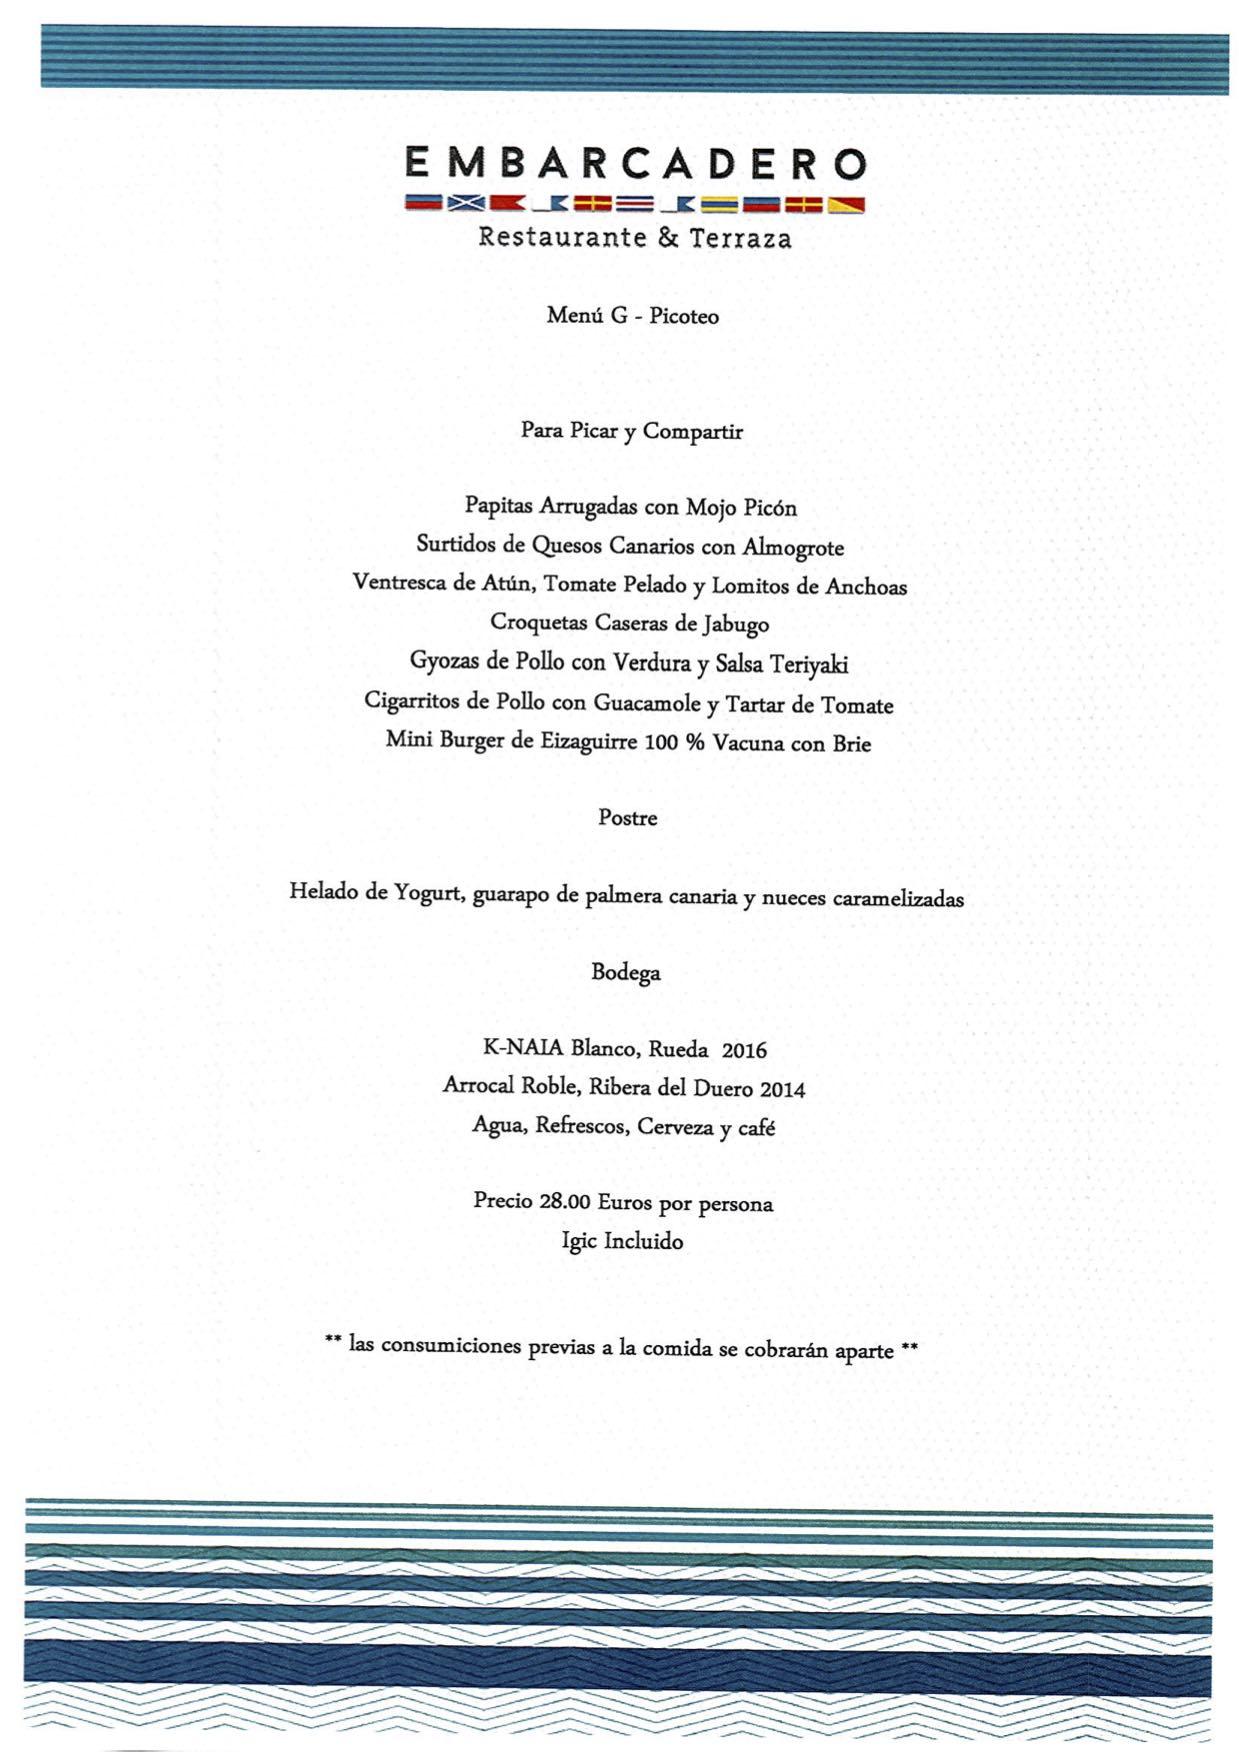 embarcadero-eventos-menu-g